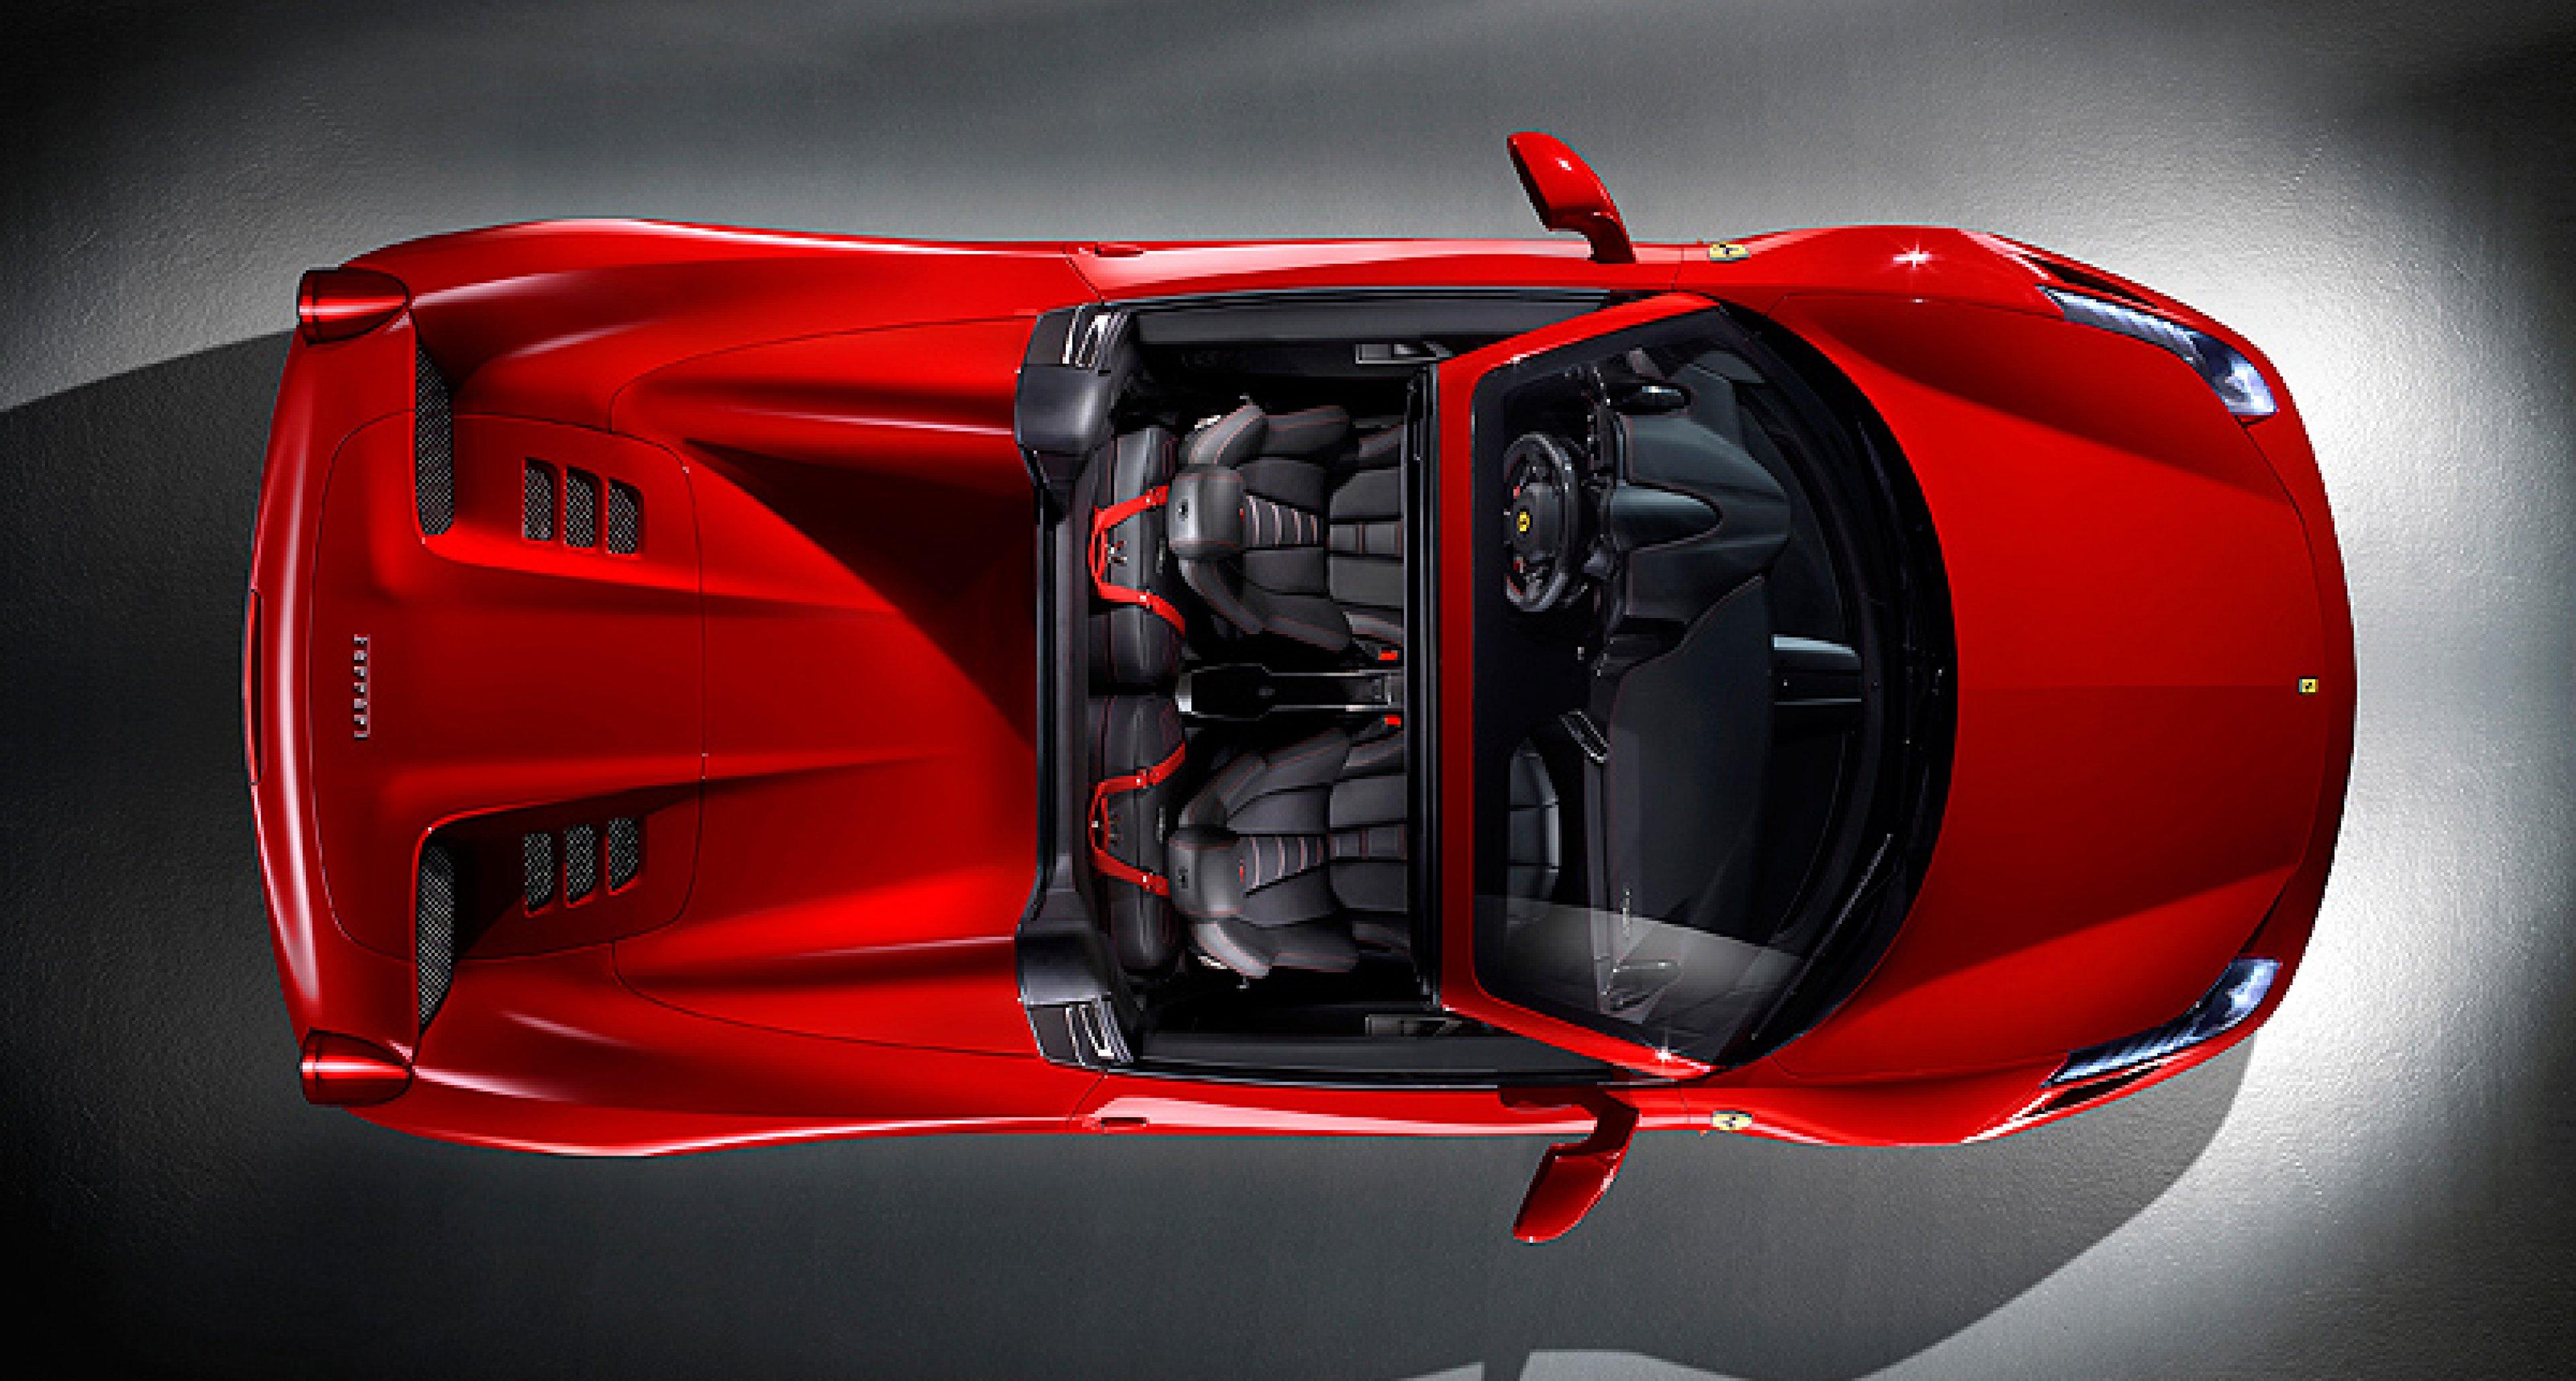 Ferrari 458 Spider to debut in Frankfurt